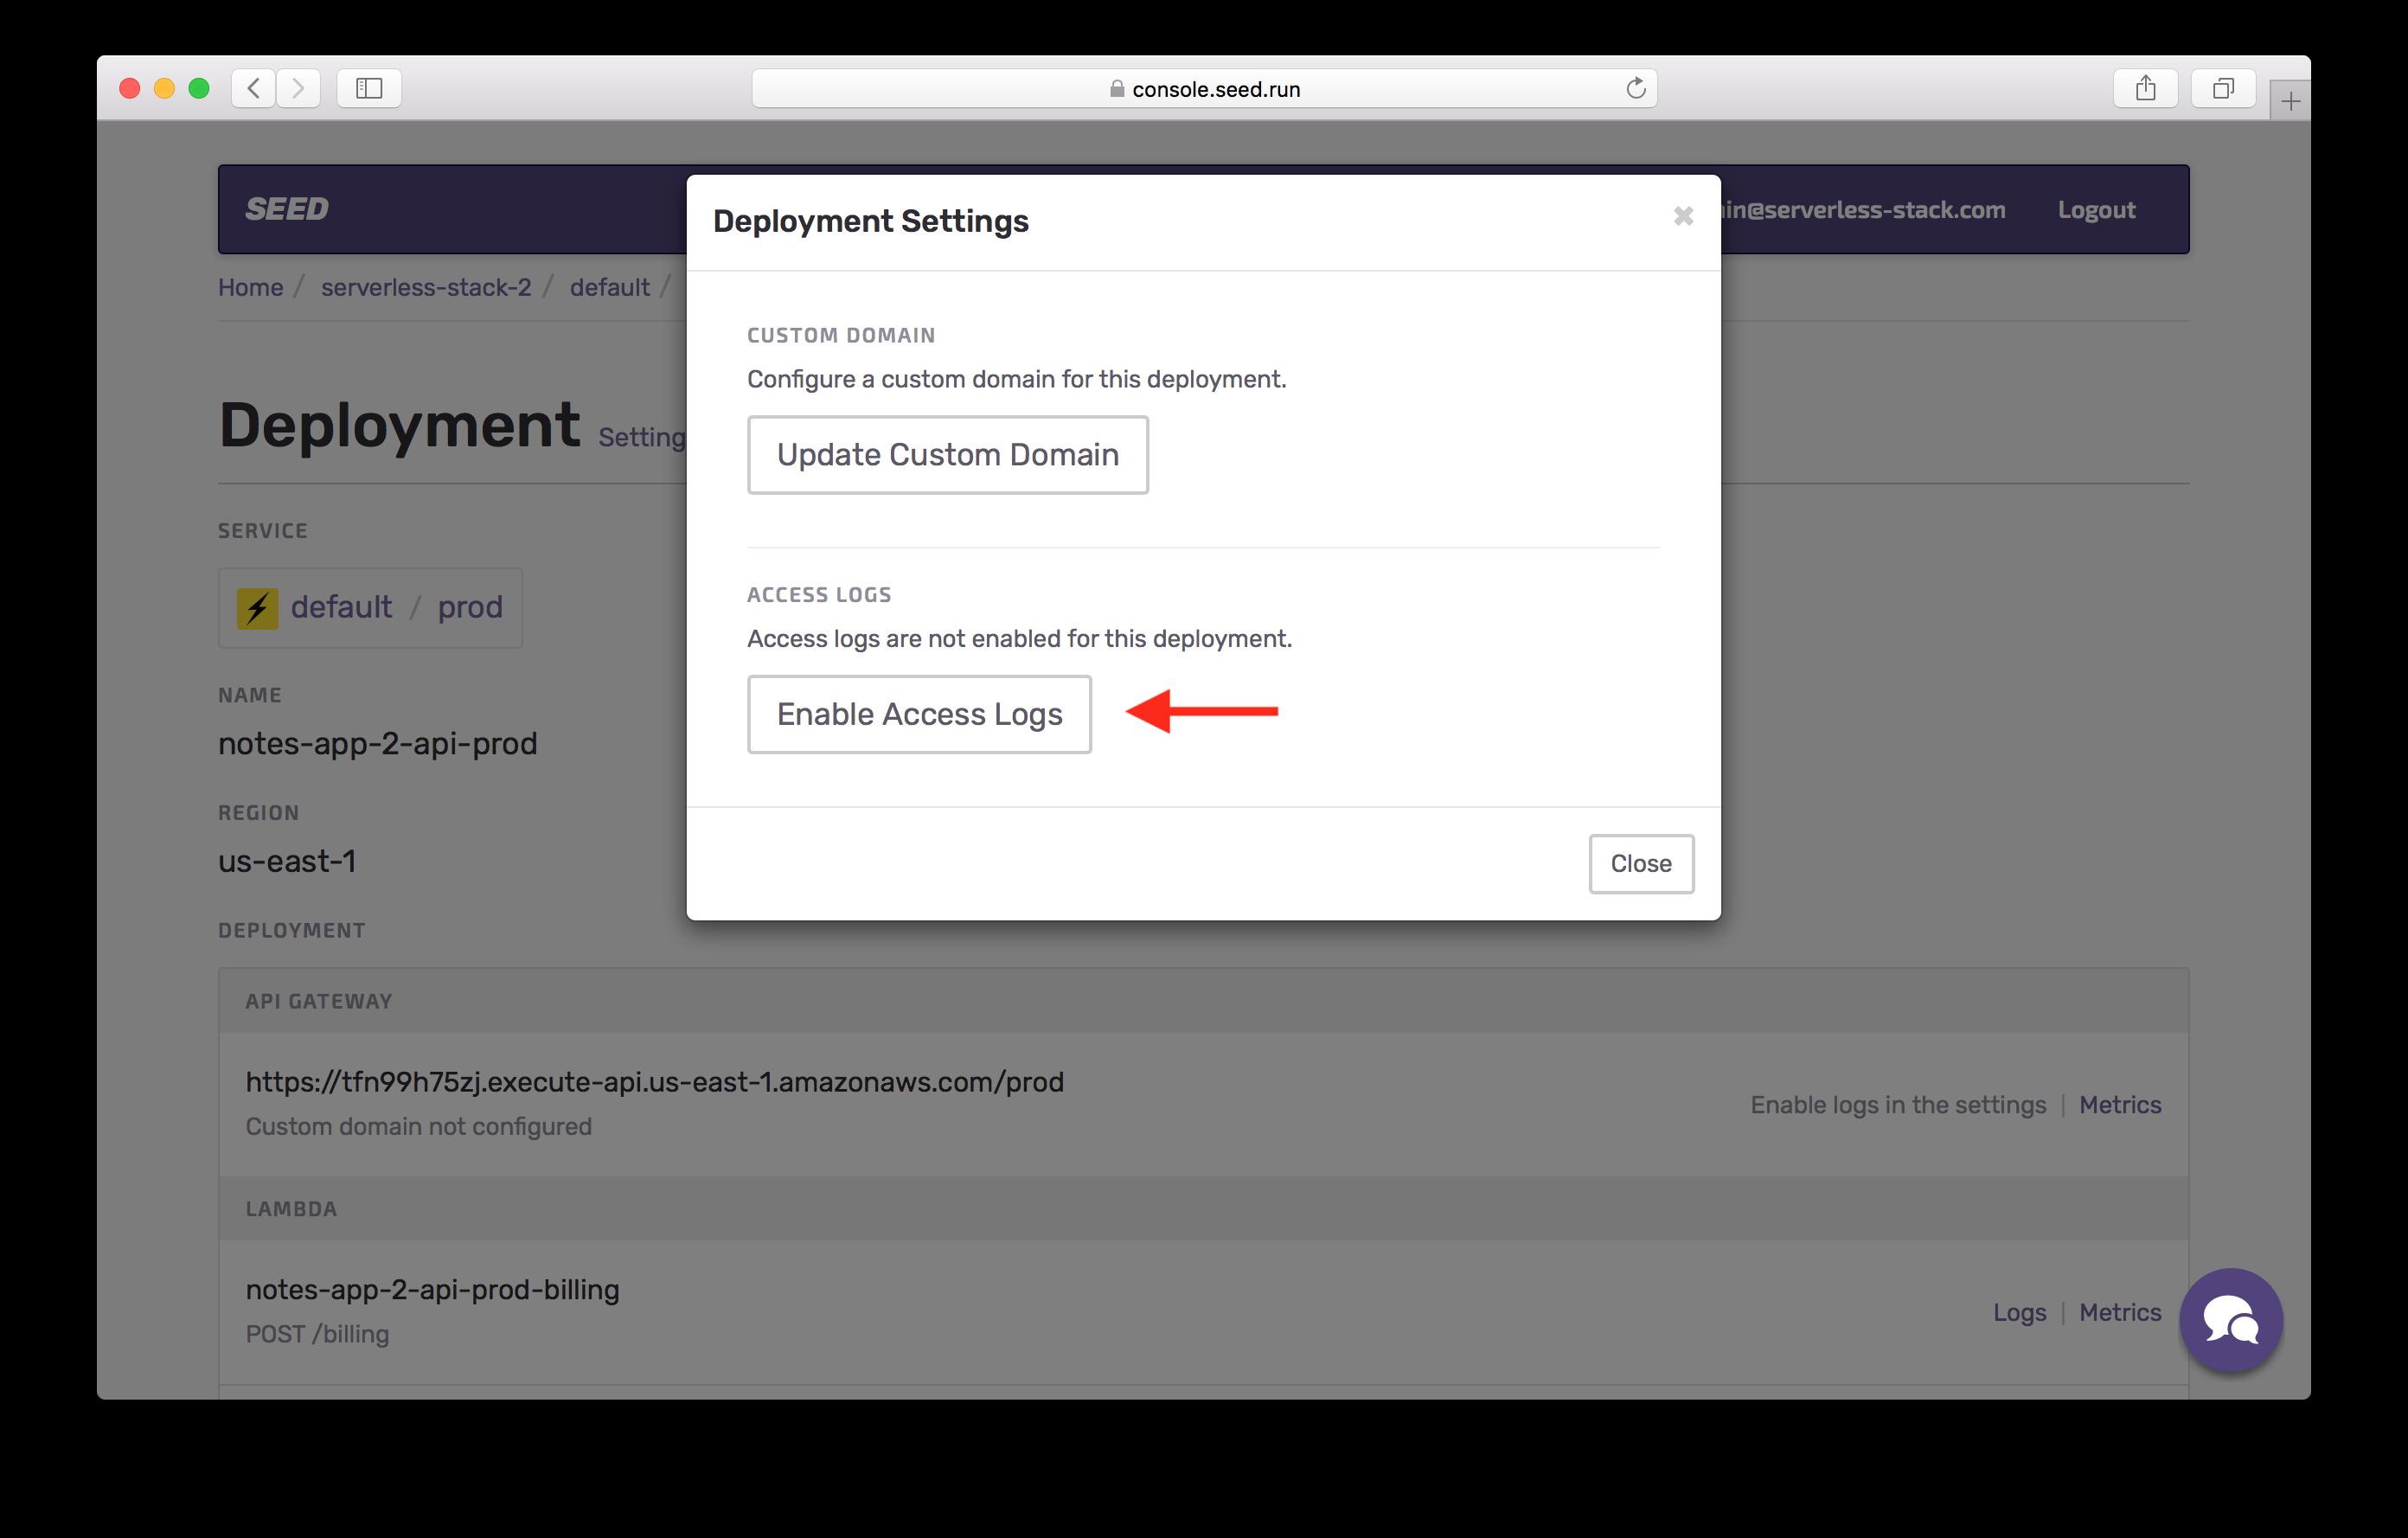 Enable access logs in prod screenshot